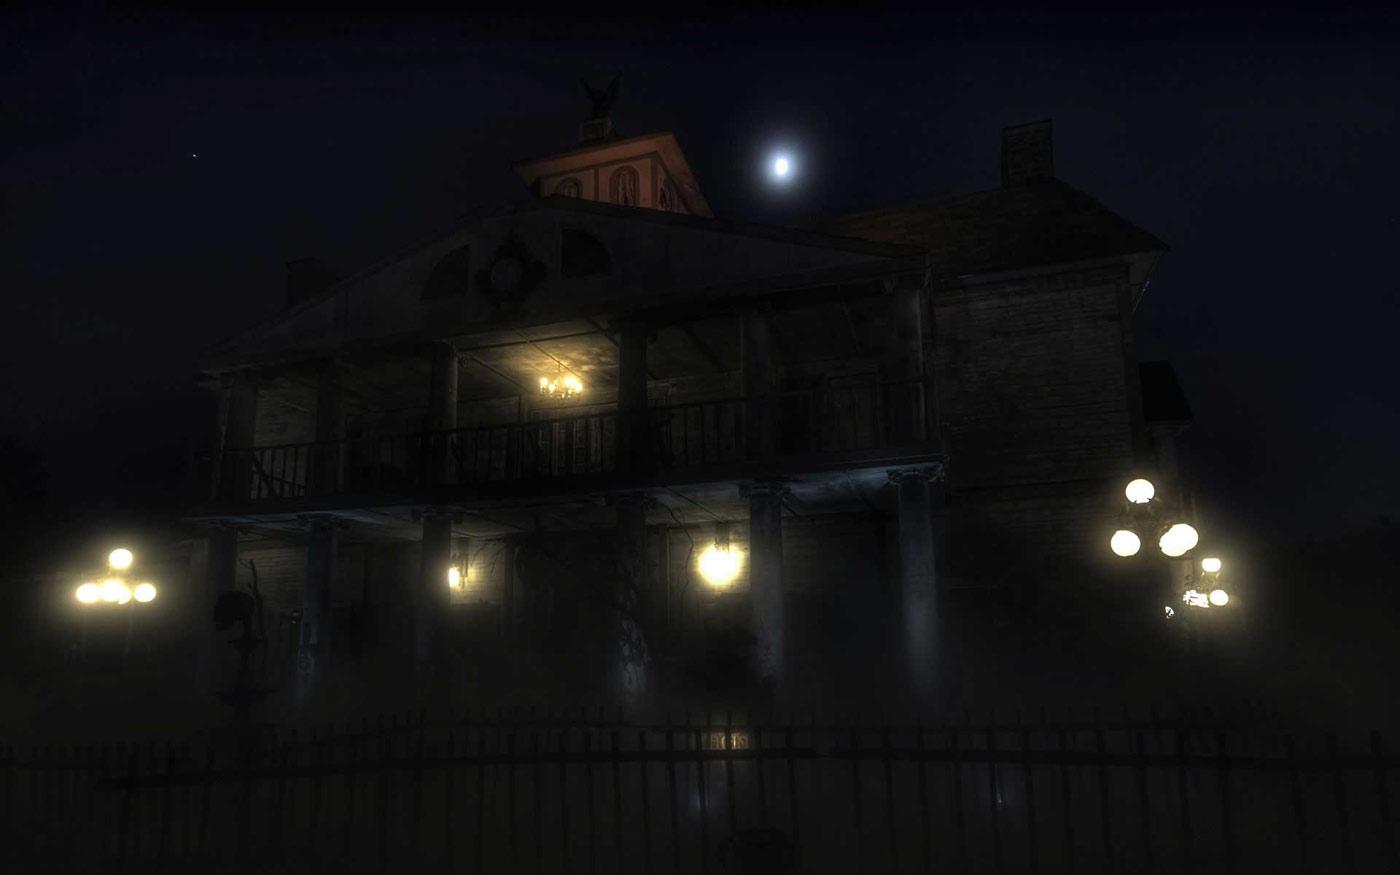 Thrillvania – haunted house